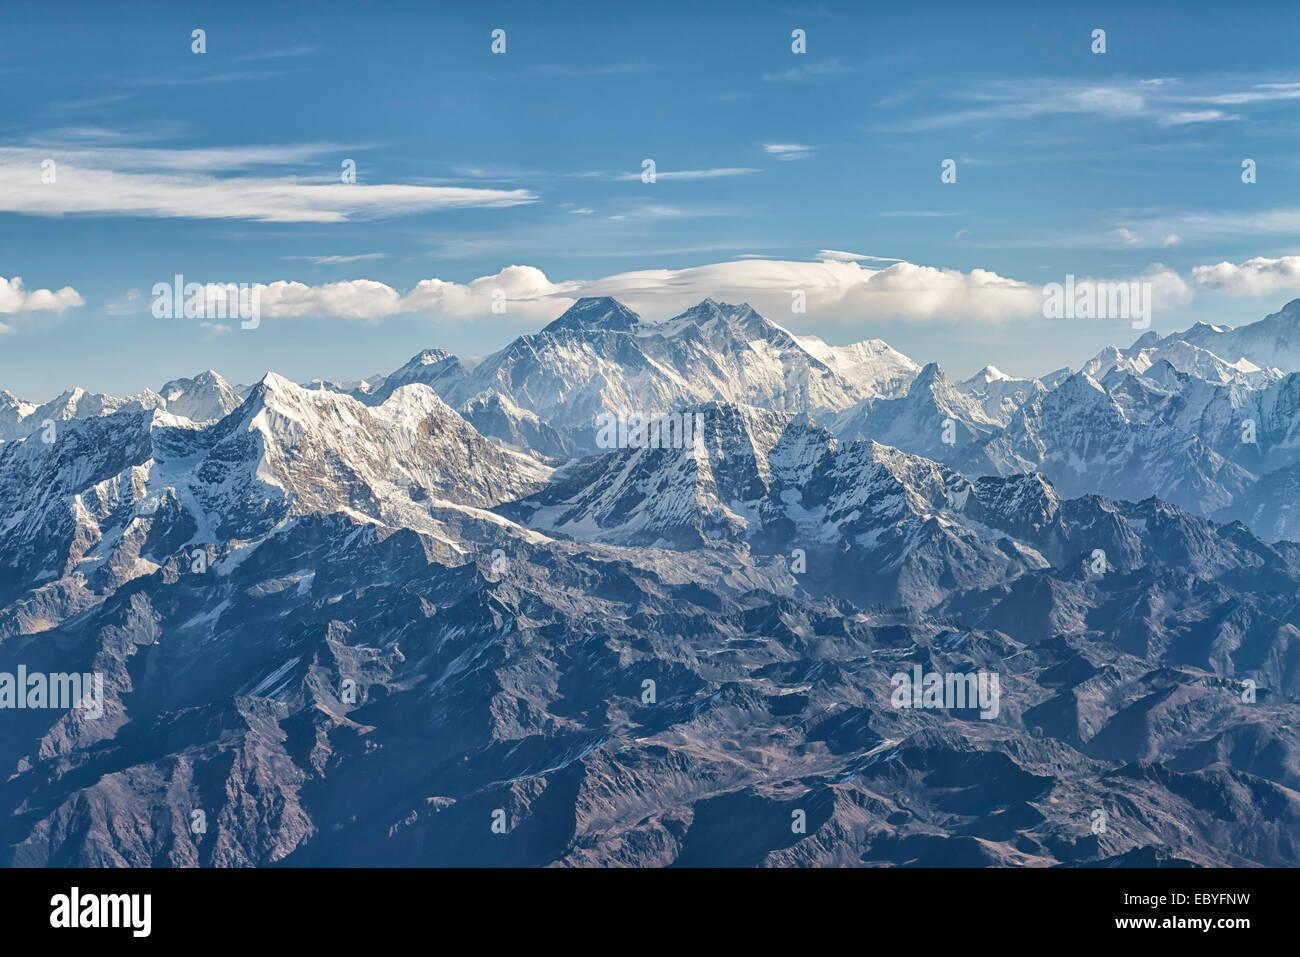 Il monte Everest in Mahalangur, Nepal Immagini Stock